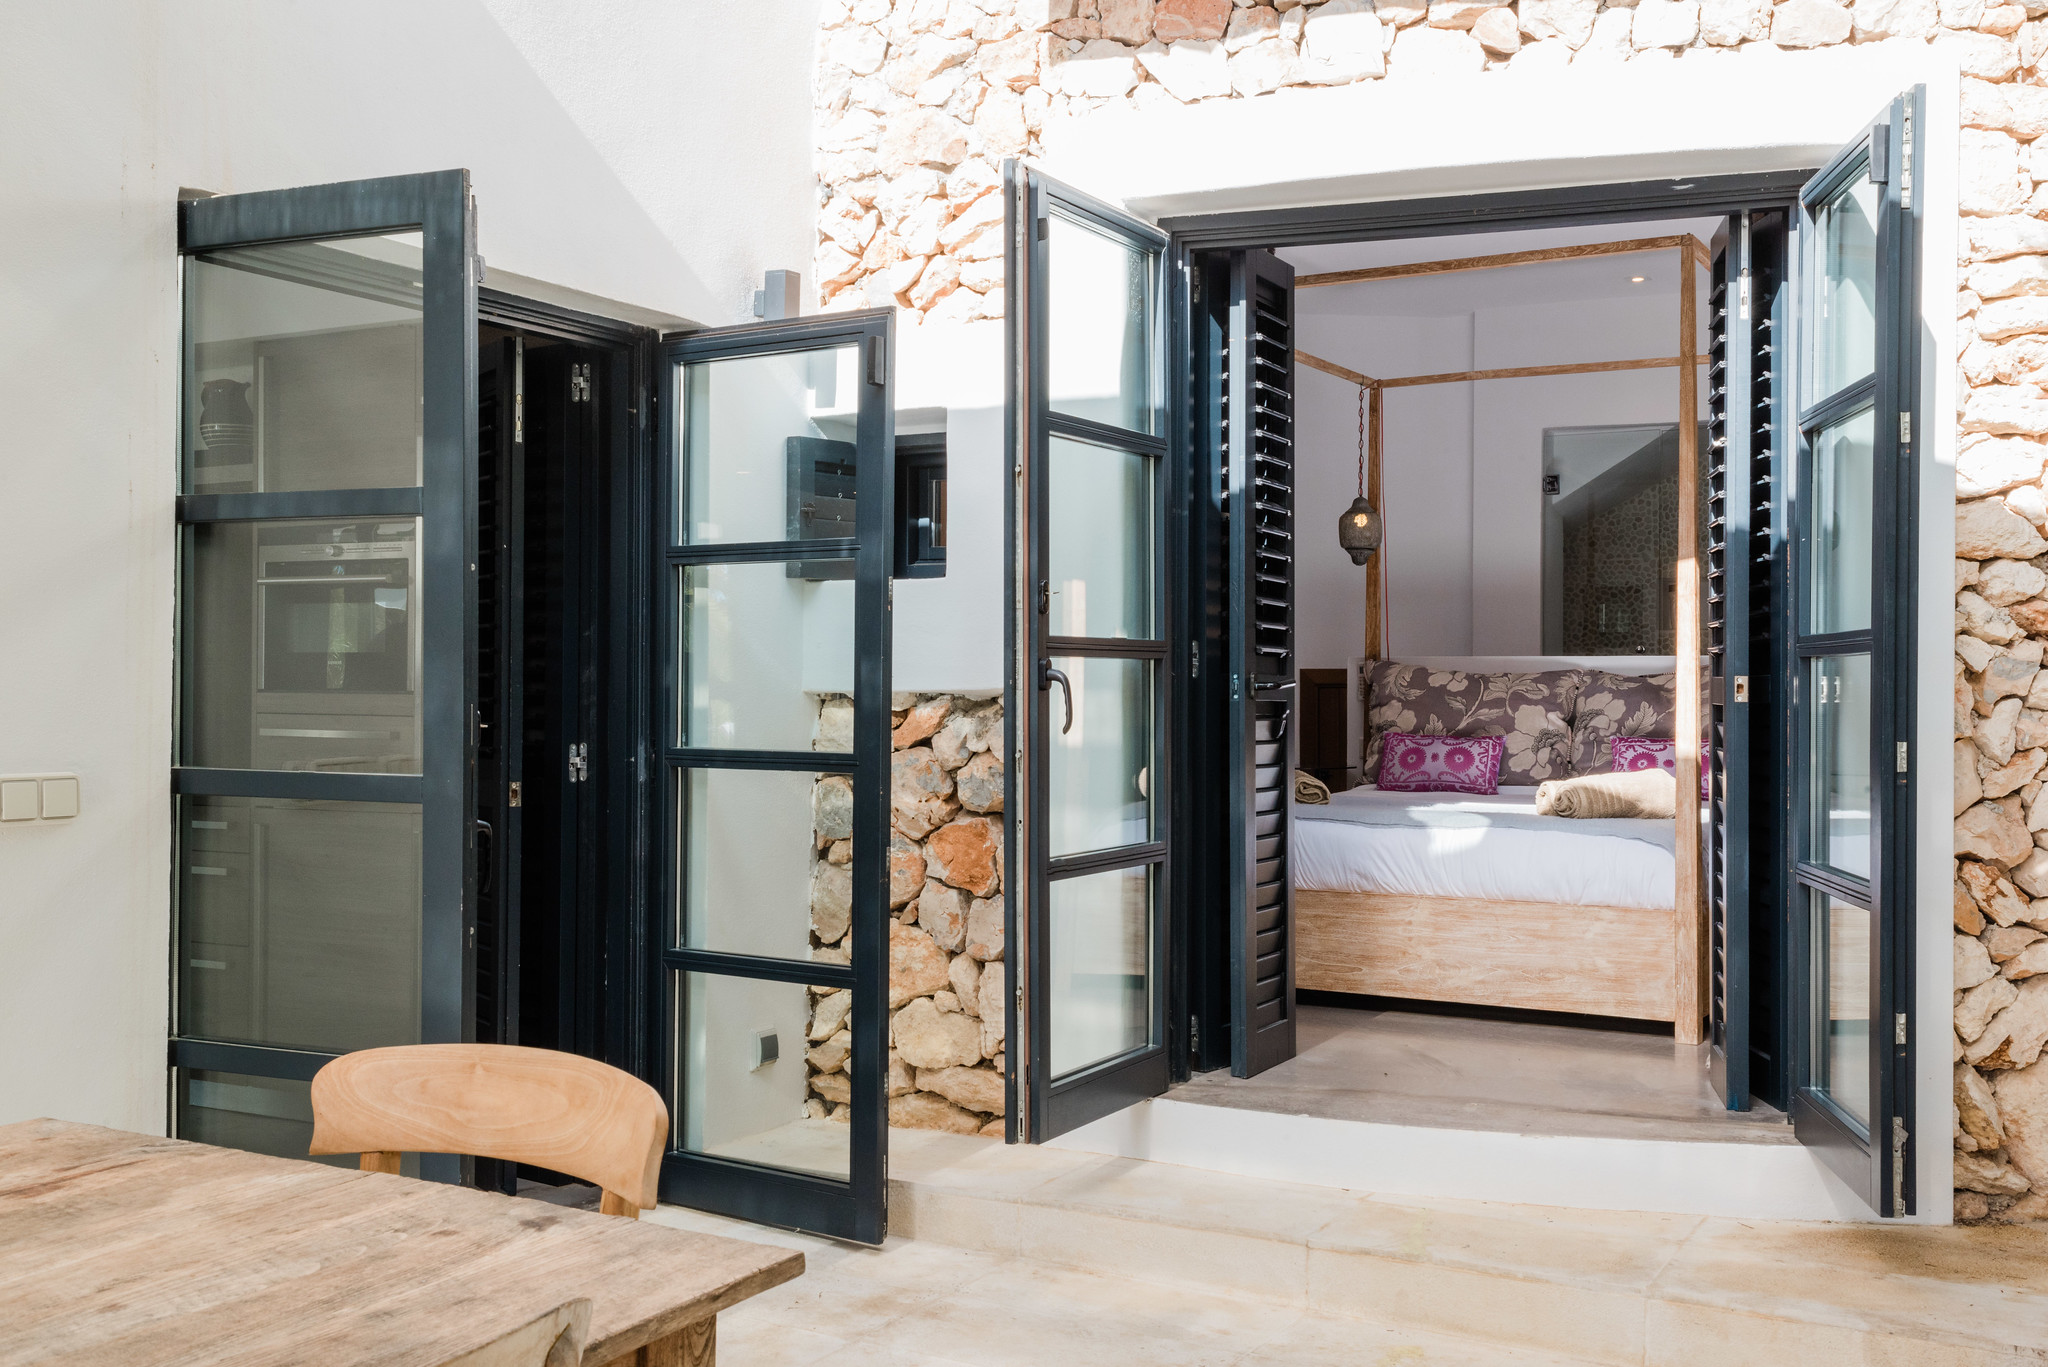 https://www.white-ibiza.com/wp-content/uploads/2020/05/white-ibiza-villas-casa-amalia-exterior-table.jpg